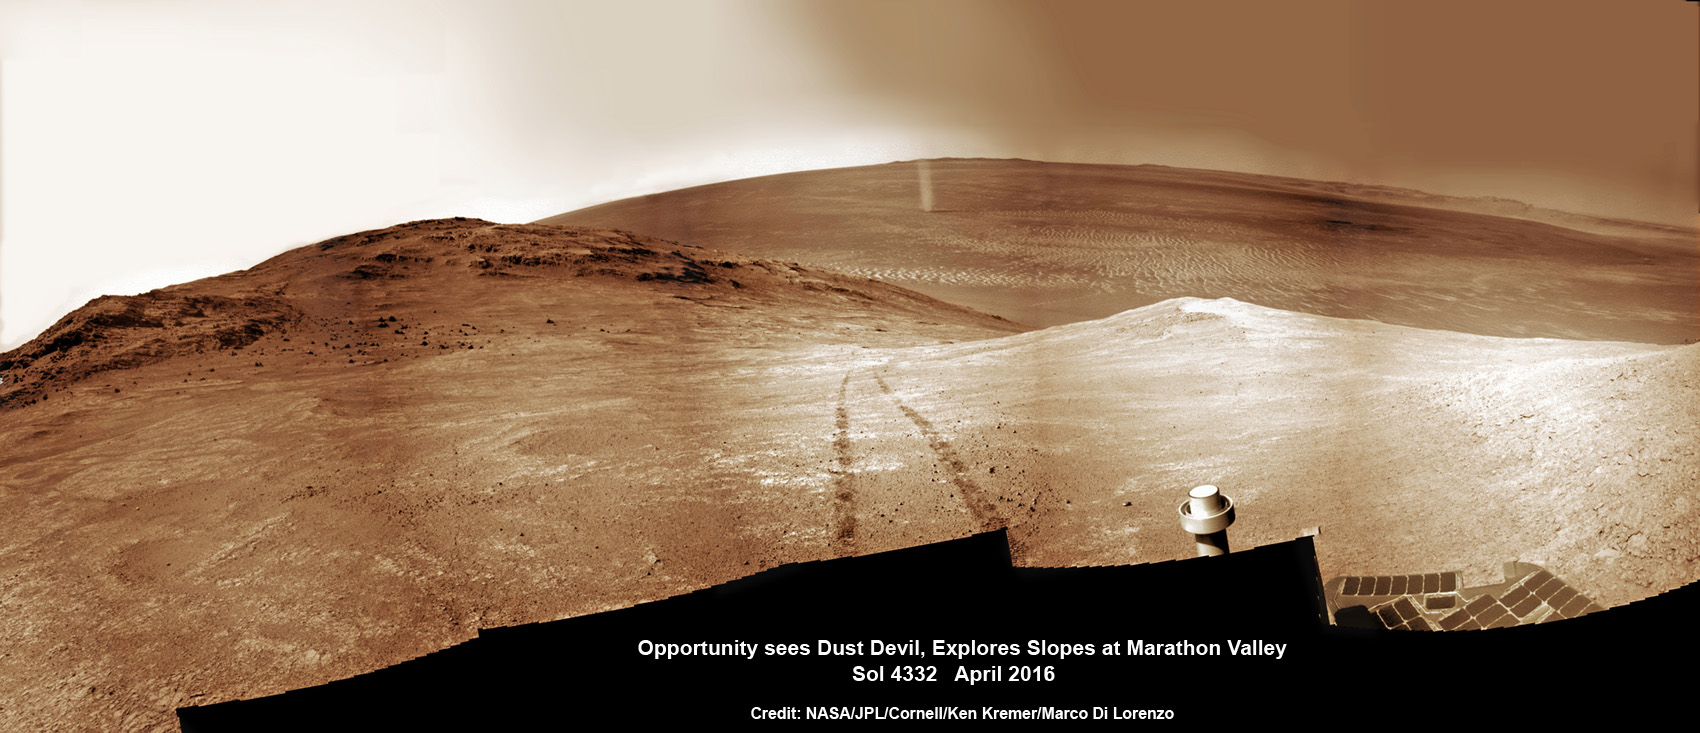 Credit: NASA / JPL / Cornell / Ken Kremer (kenkremer.com) / Marco Di Lorenzo